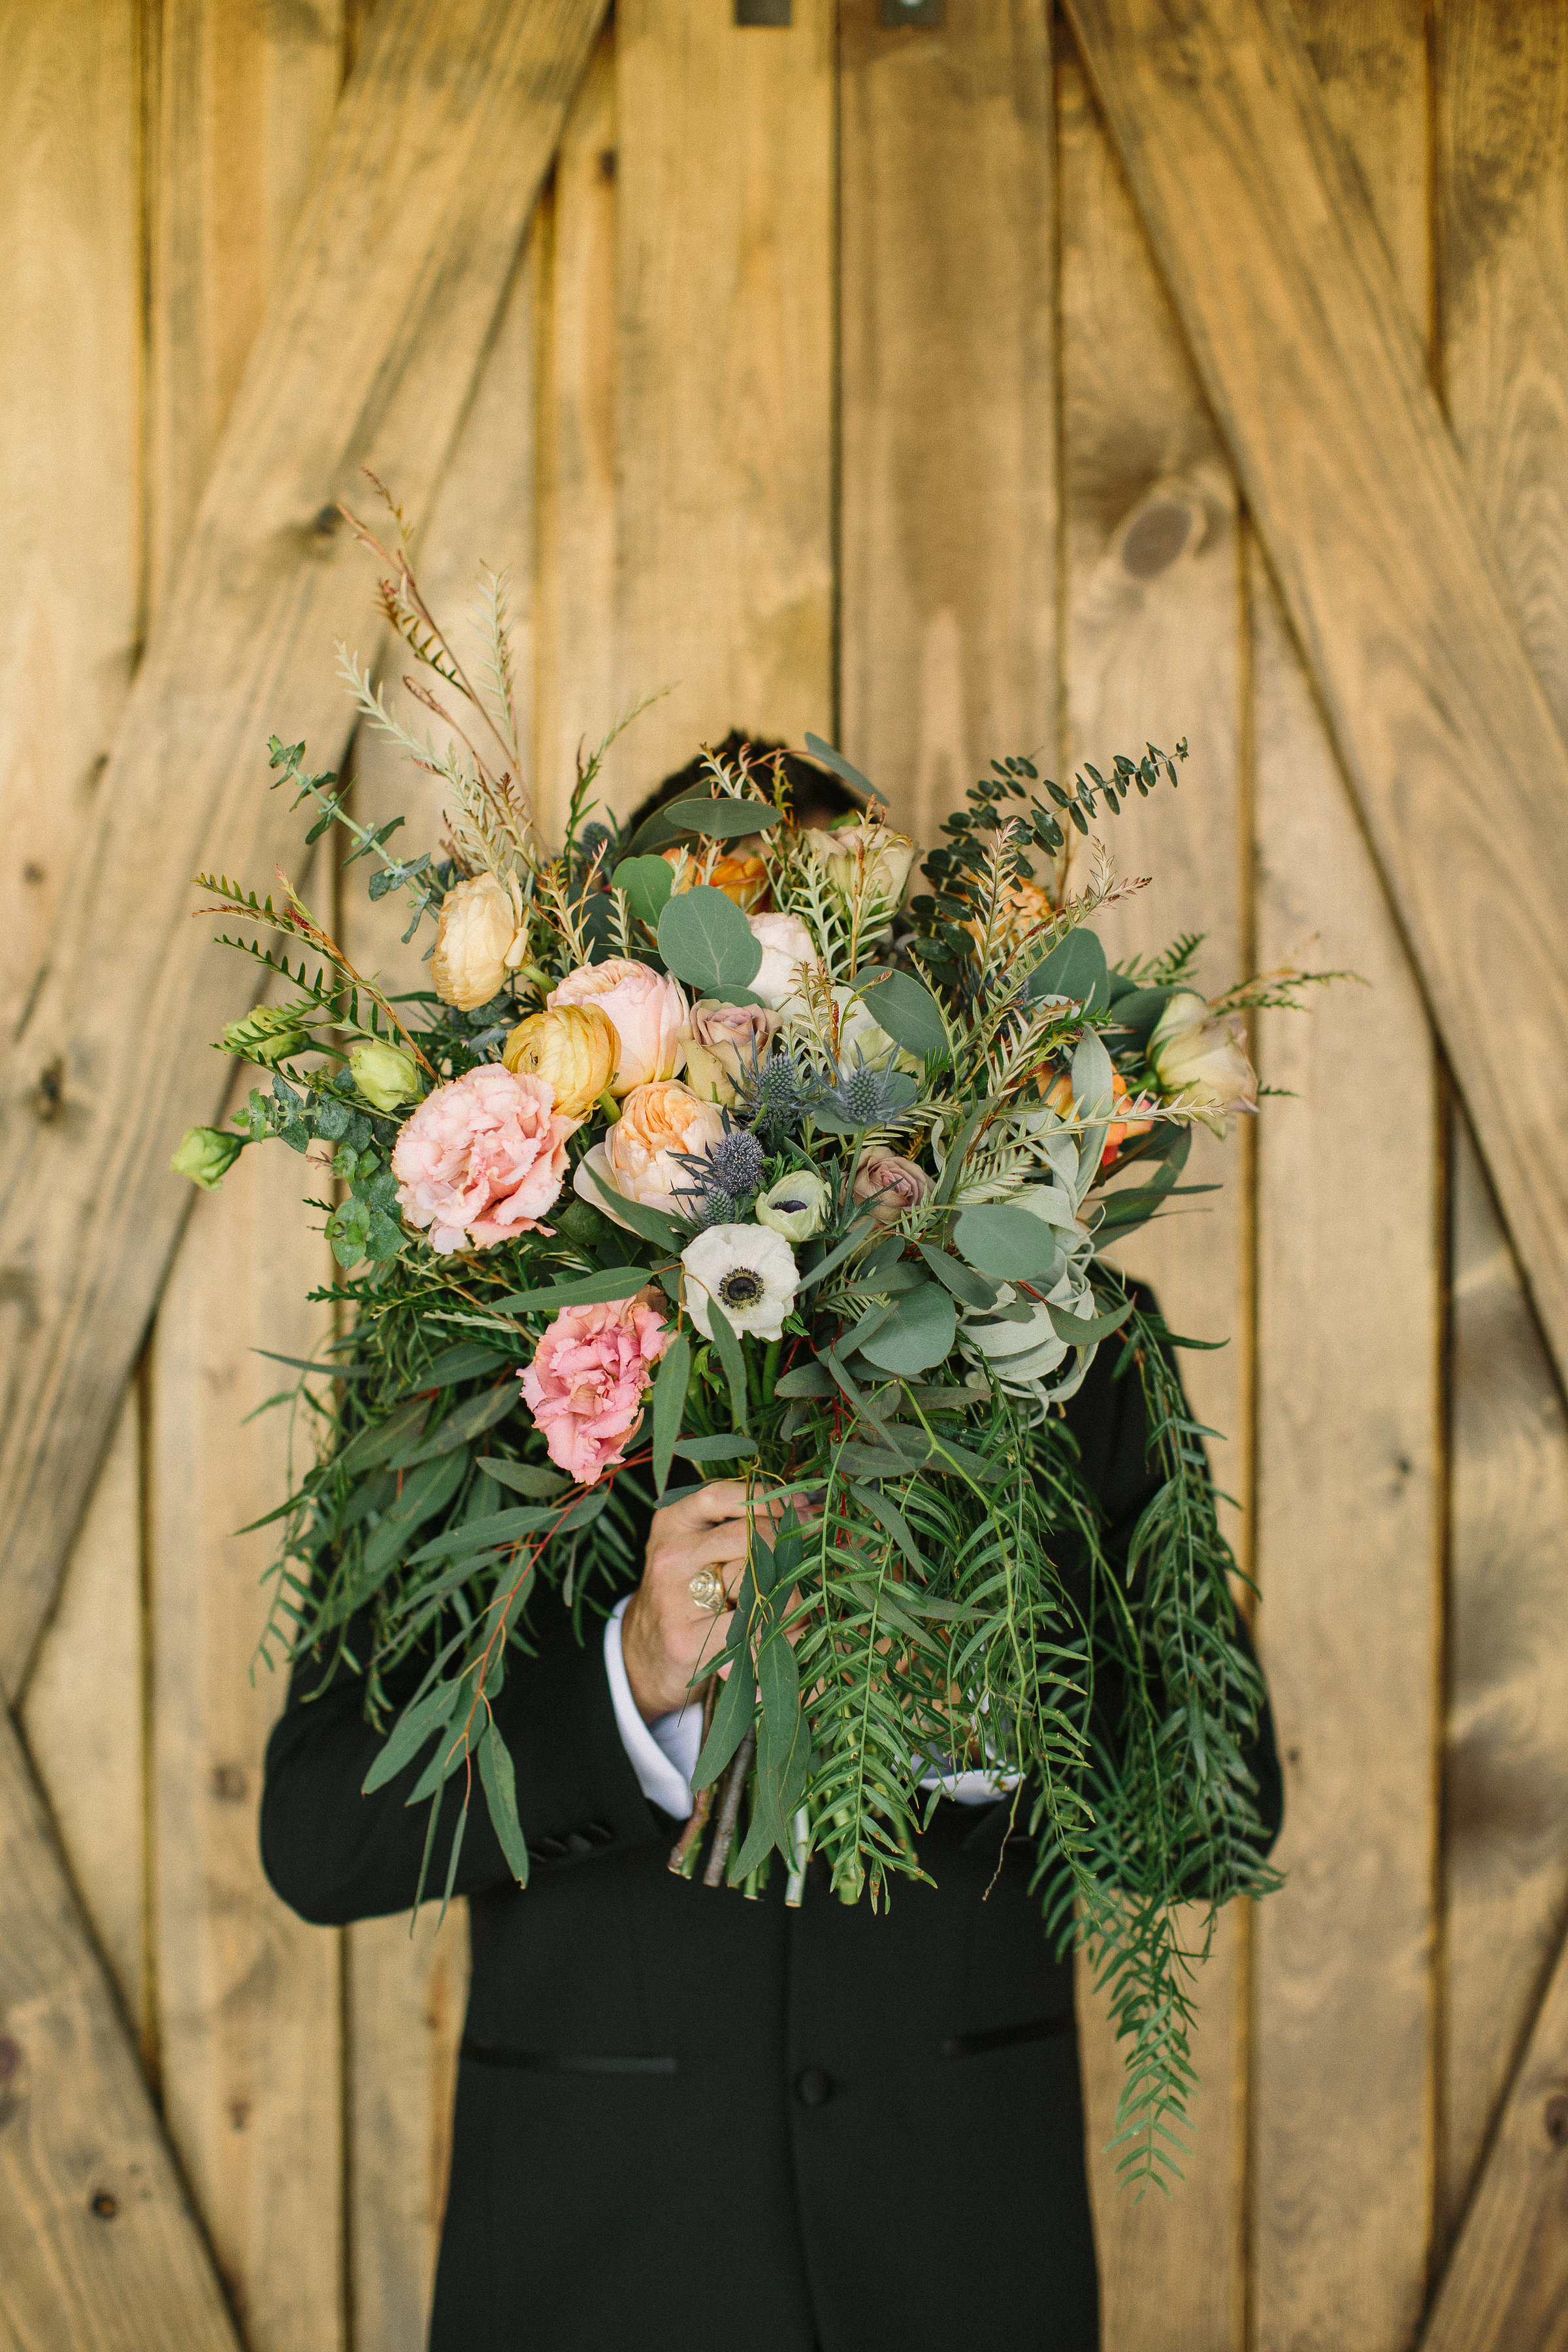 Ellen-Ashton-Photography-Peach-Creek-Ranch-Weddings-Wed-and-Prosper67